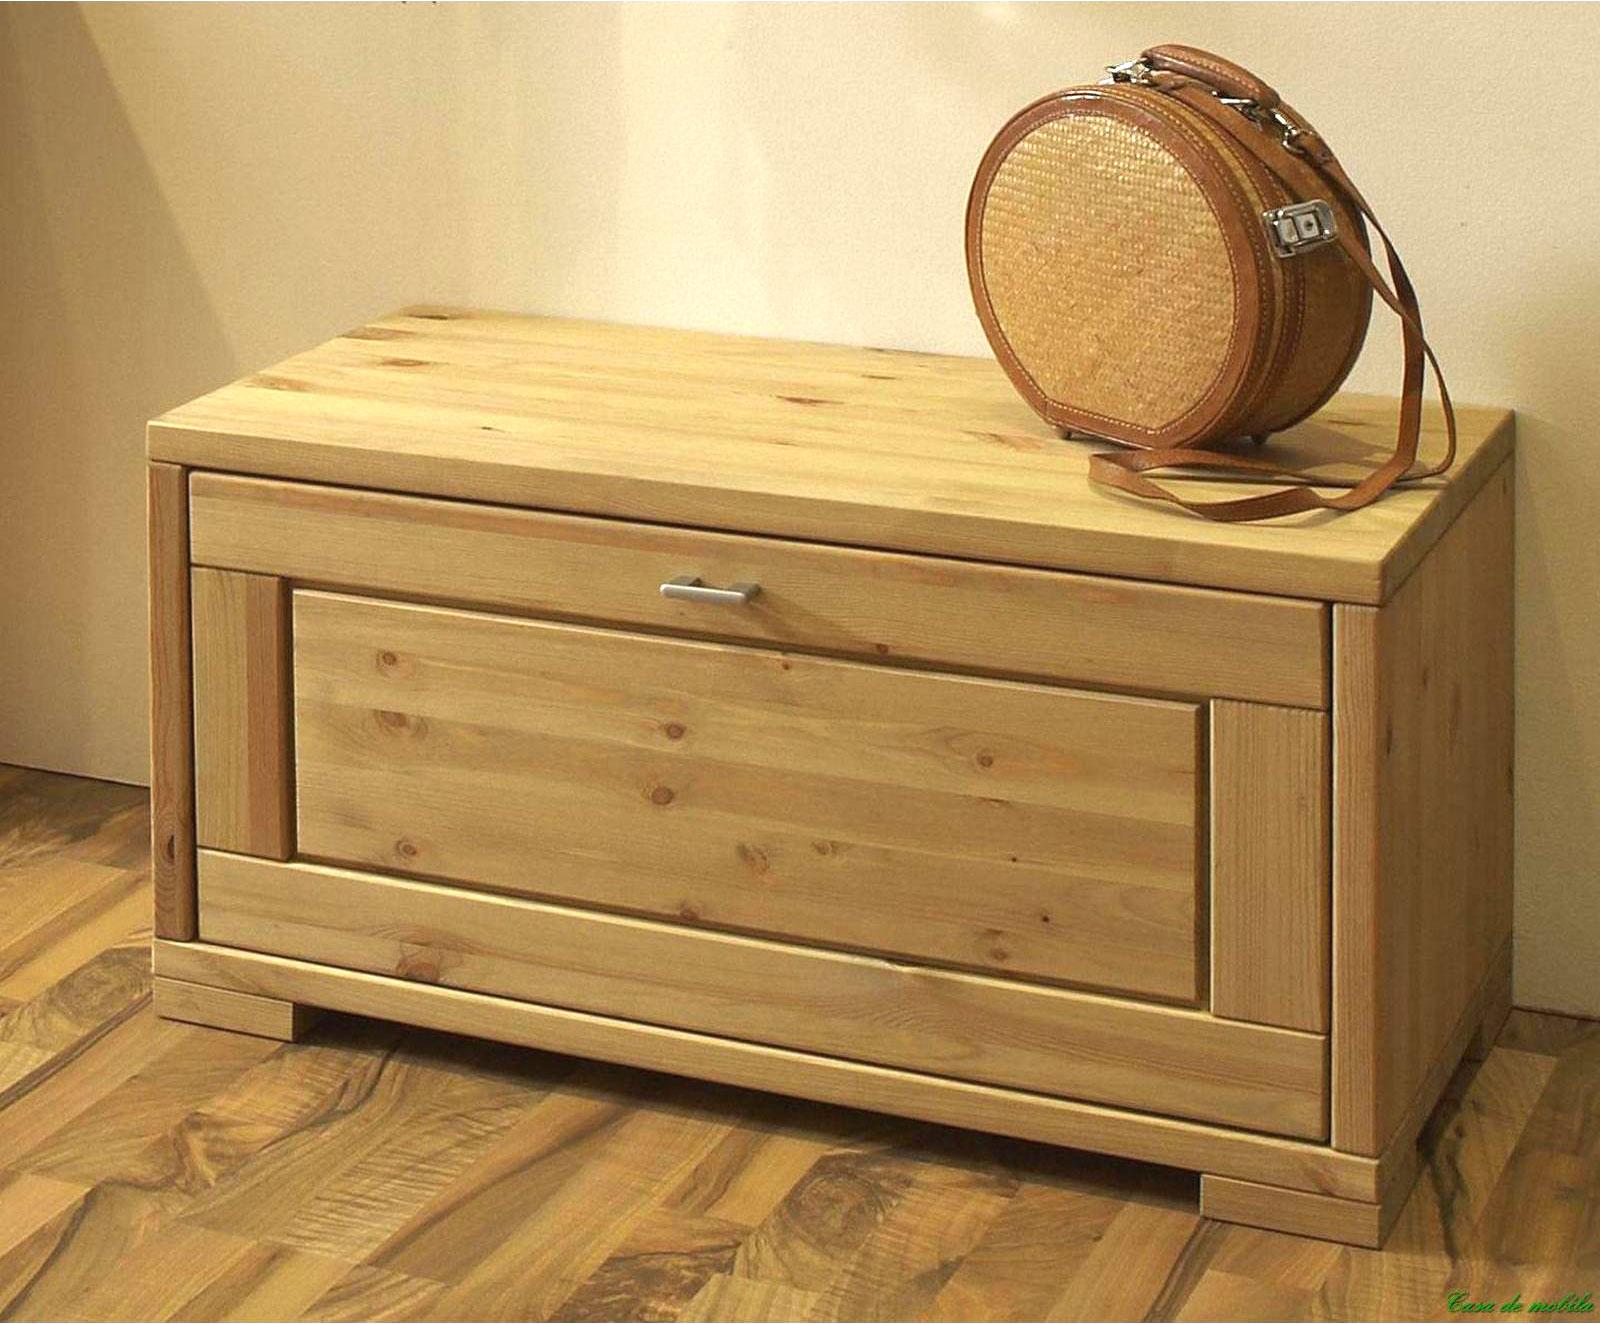 kiefer gelaugt innenr ume und m bel ideen. Black Bedroom Furniture Sets. Home Design Ideas